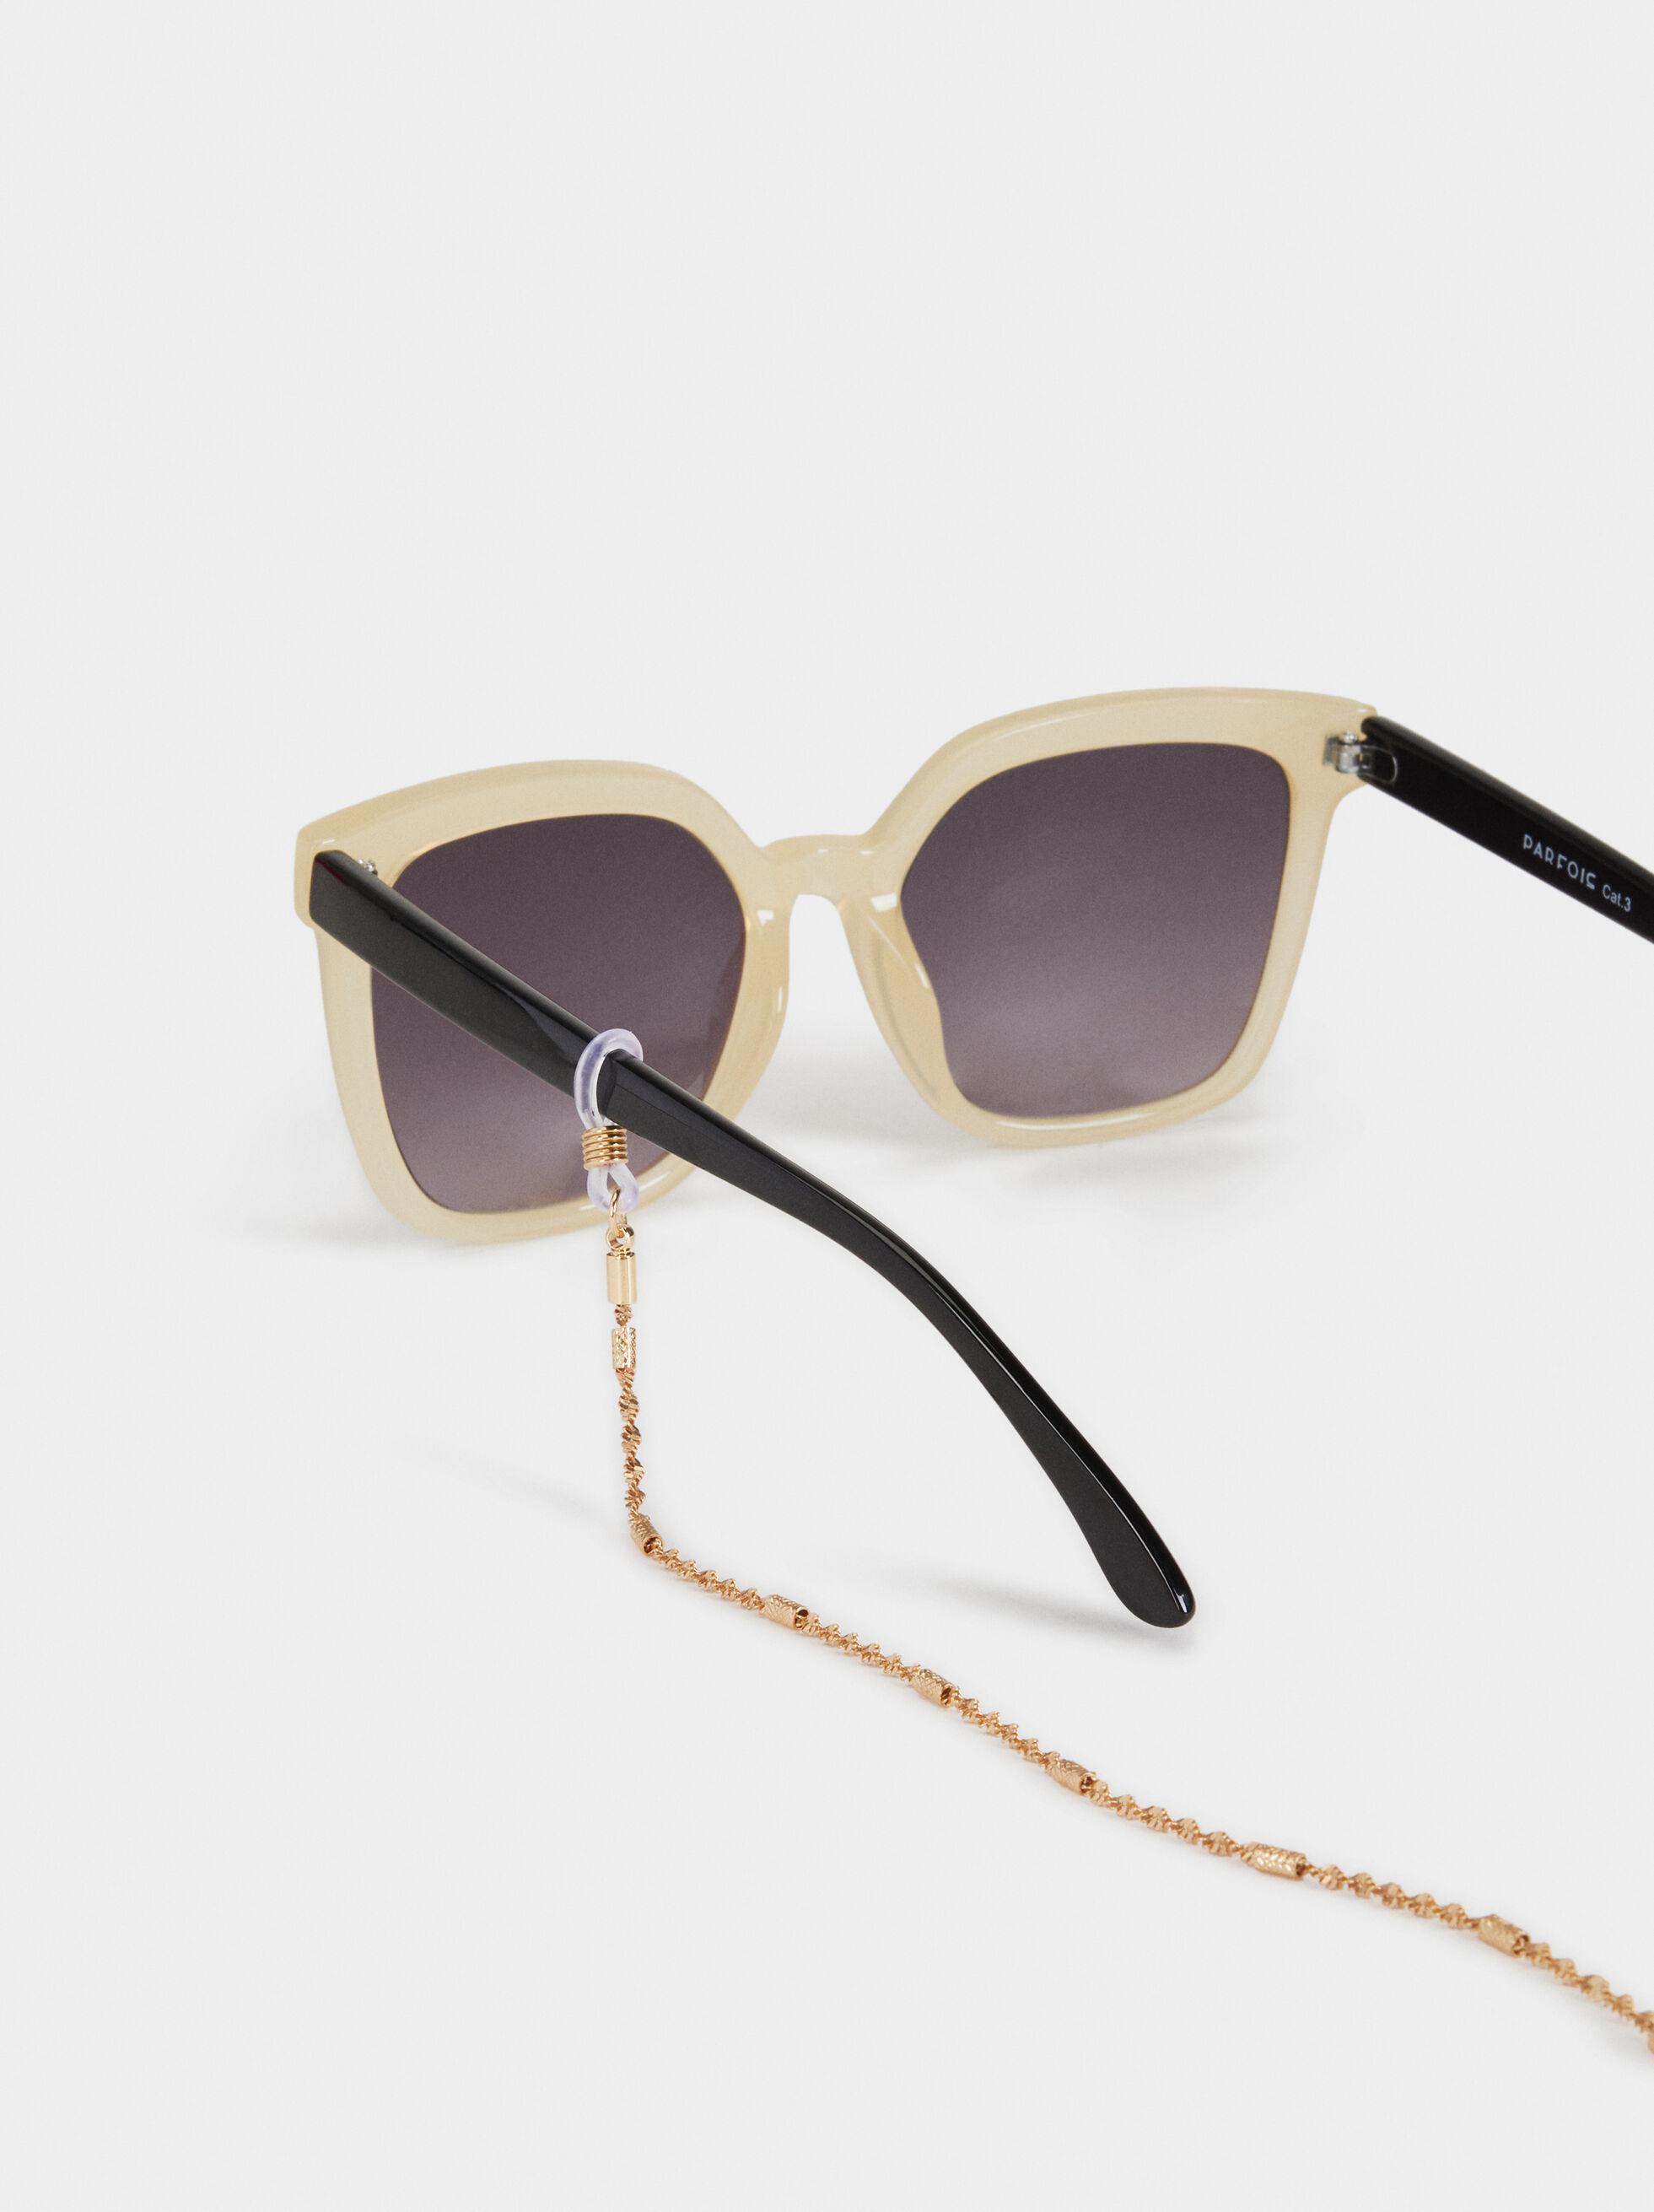 Chain Glasses Cord, Golden, hi-res